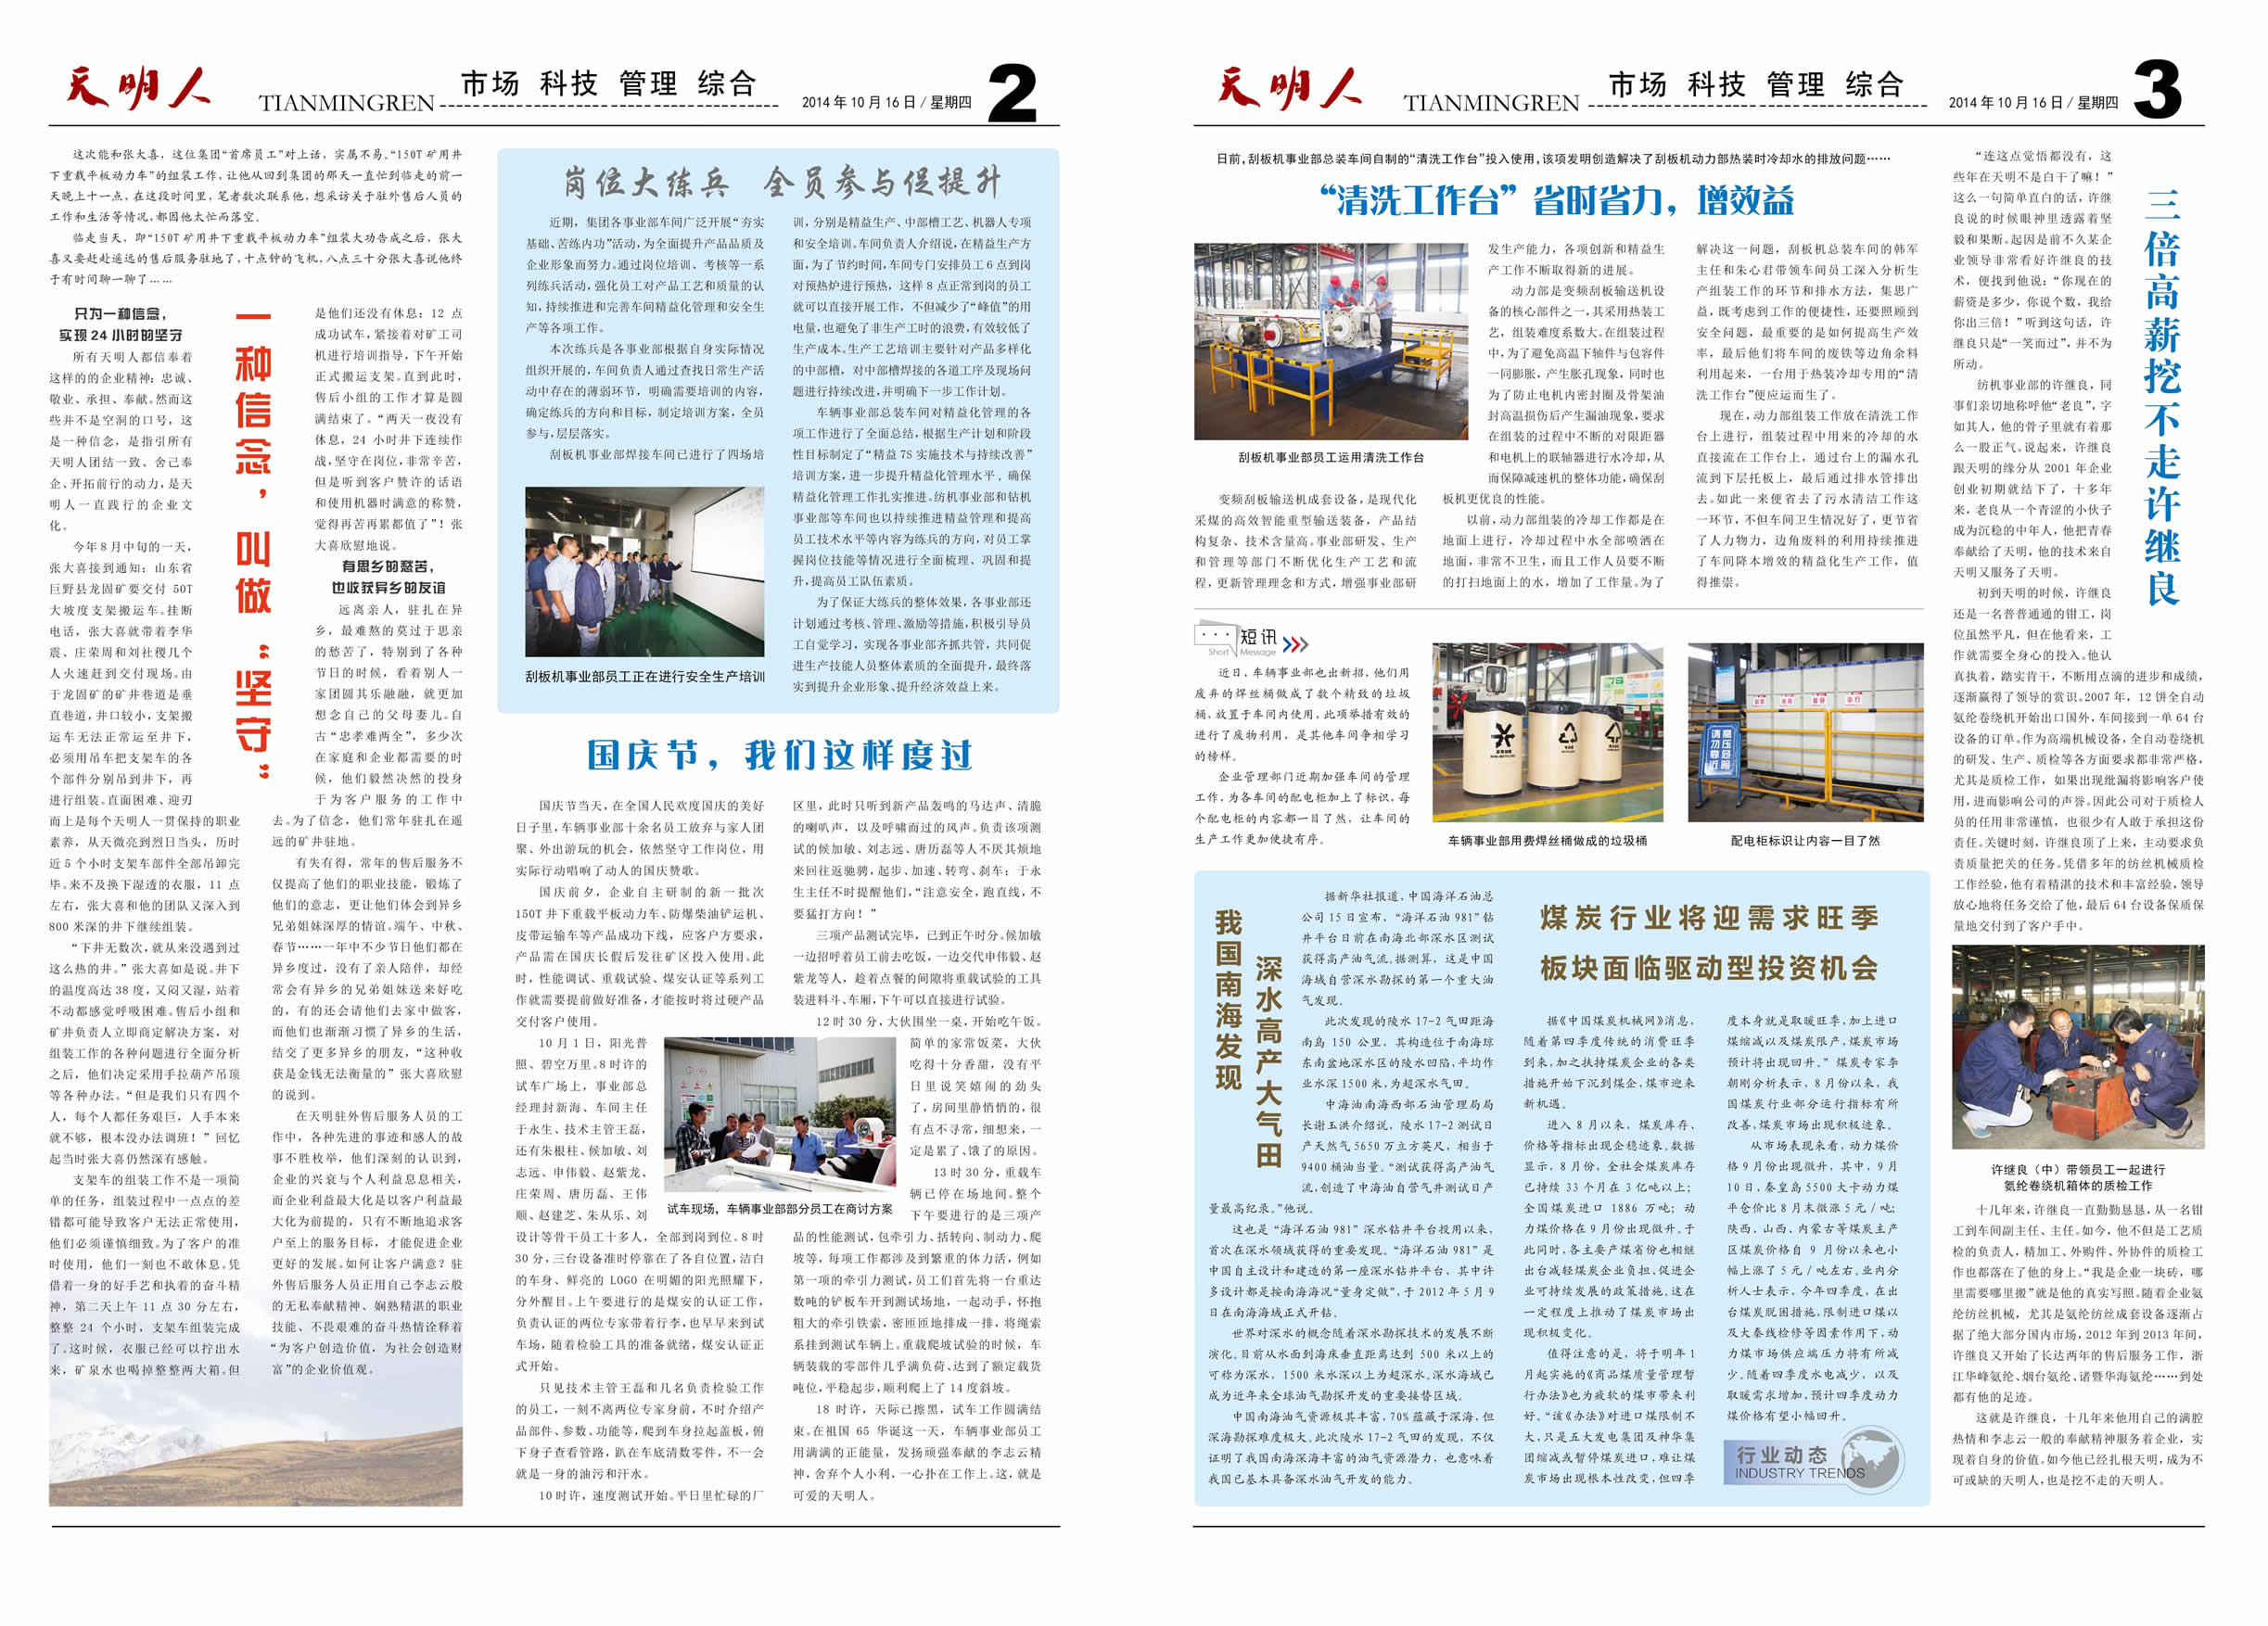 hg711皇冠国际_hg88皇冠国际平台_hg皇冠国际vip首页人2014第10期(总第85期)2、3版